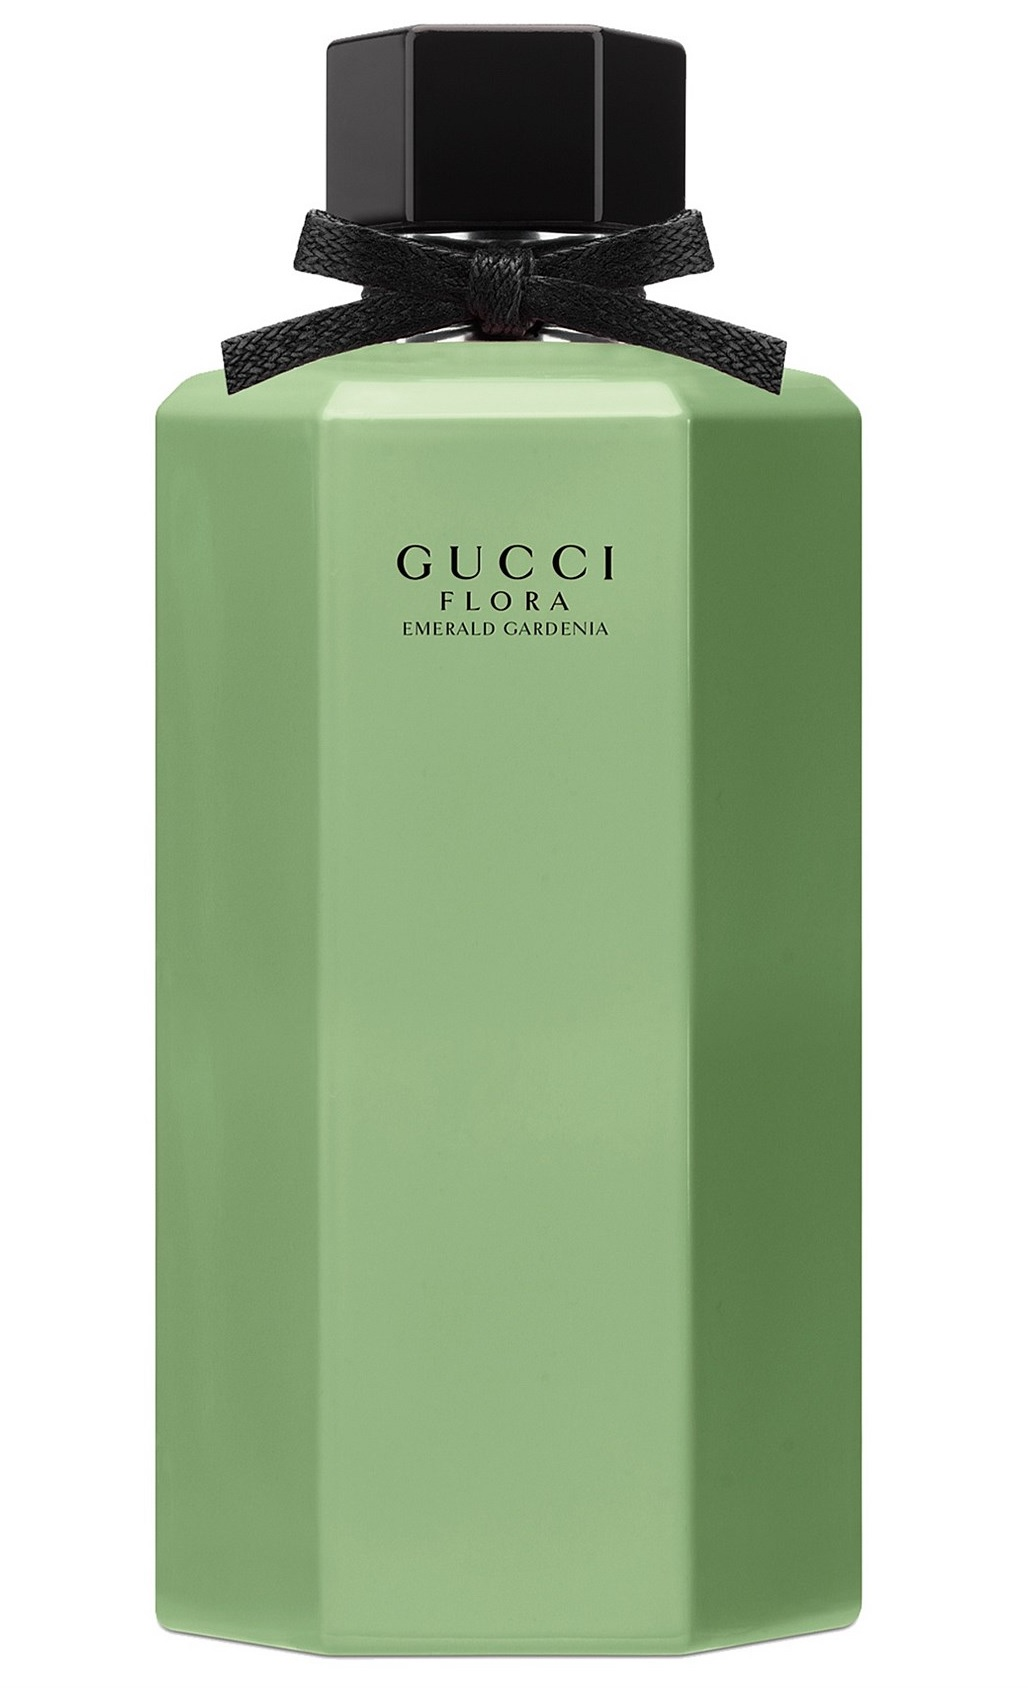 Gucci Flora Emerald Gardenia Limited Edition Women's Perfume